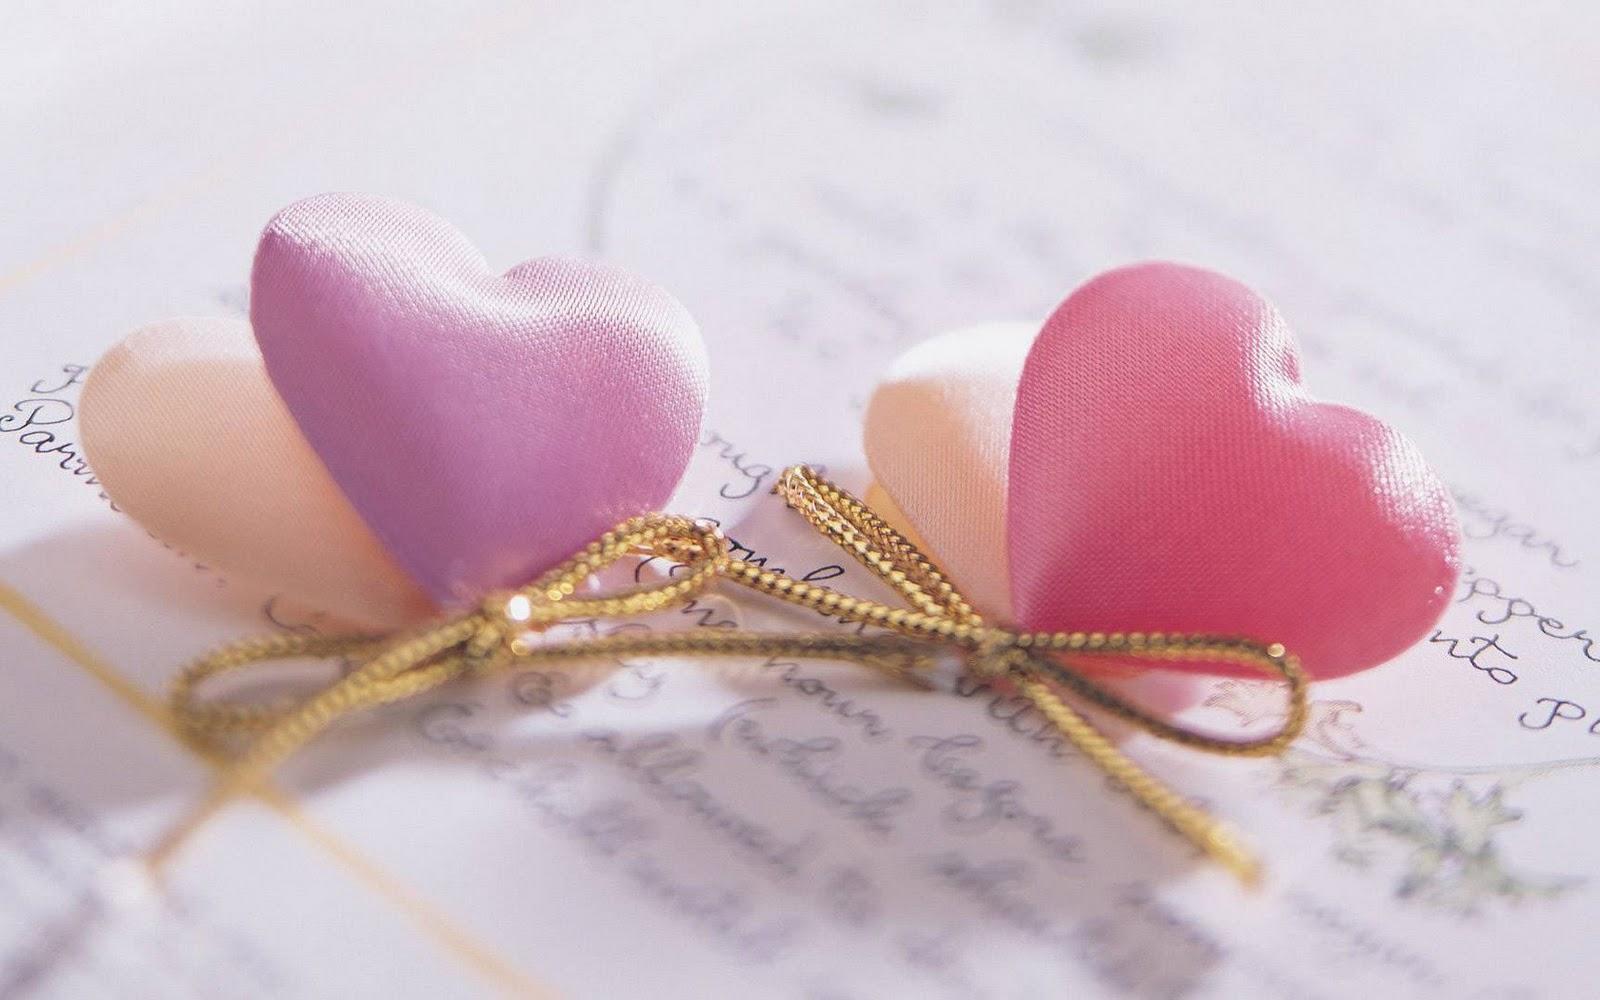 http://3.bp.blogspot.com/-CbyBGGT0UEU/T-cHo1sGcII/AAAAAAAAAhc/9oasFfaV8wg/s1600/Love%20Letter%20Love%20Wallpaper.jpg